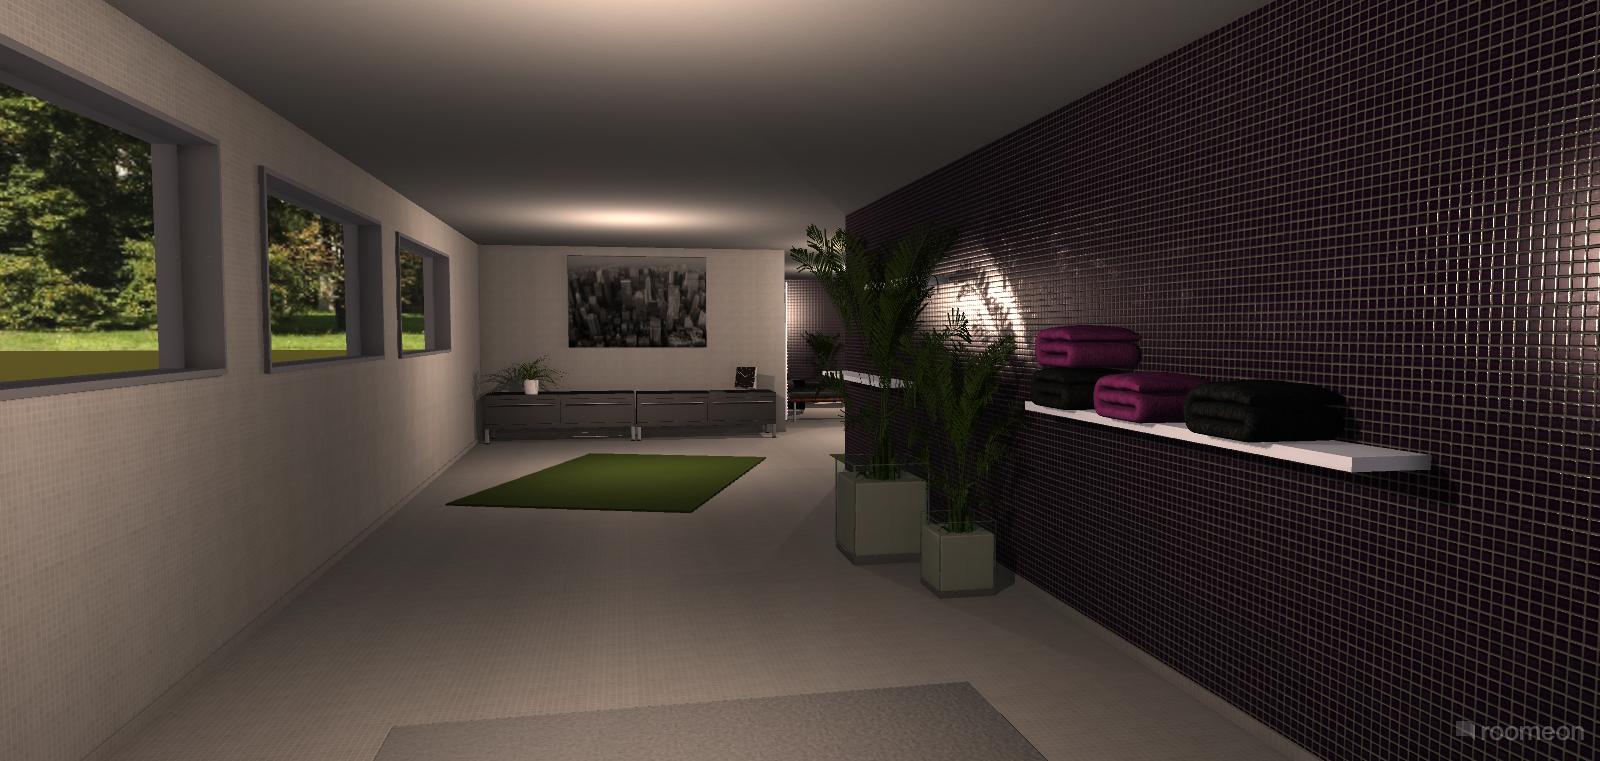 Raumplanung badezimmer roomeon community - Raumgestaltung badezimmer ...